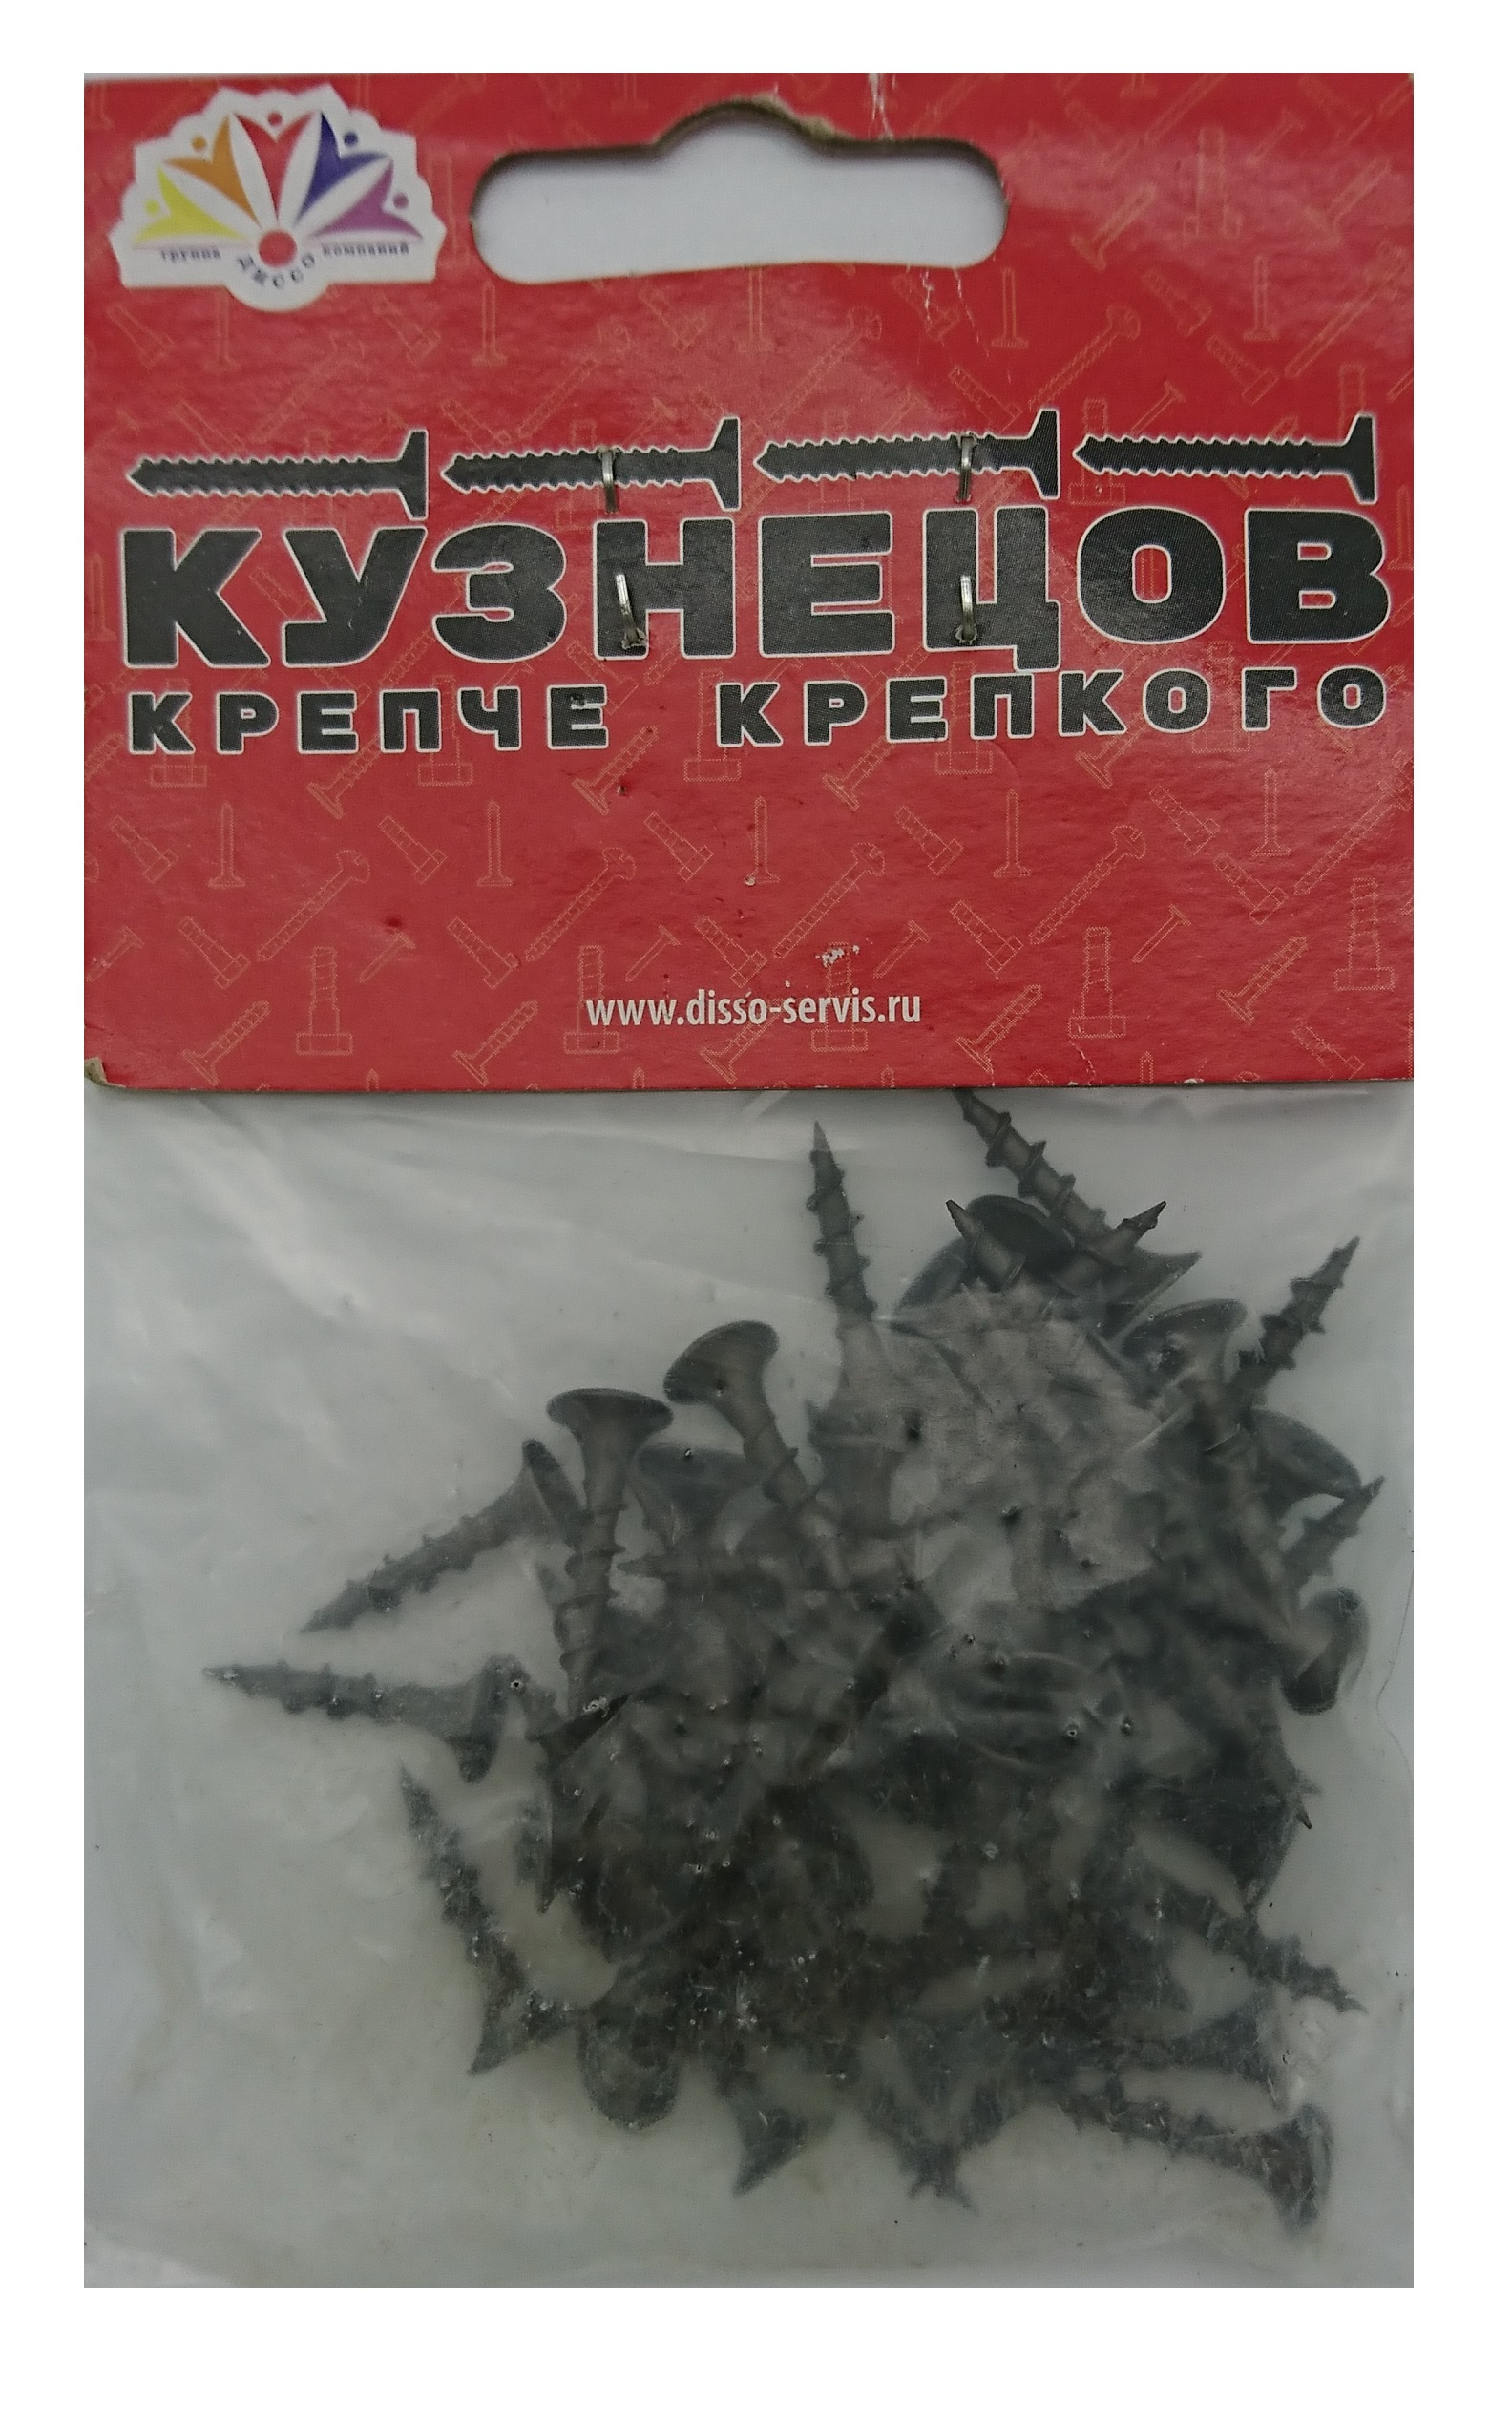 все цены на Саморез Кузнецов гипсокартон-дерево 3,5х19 (50 шт. в упаковке) онлайн